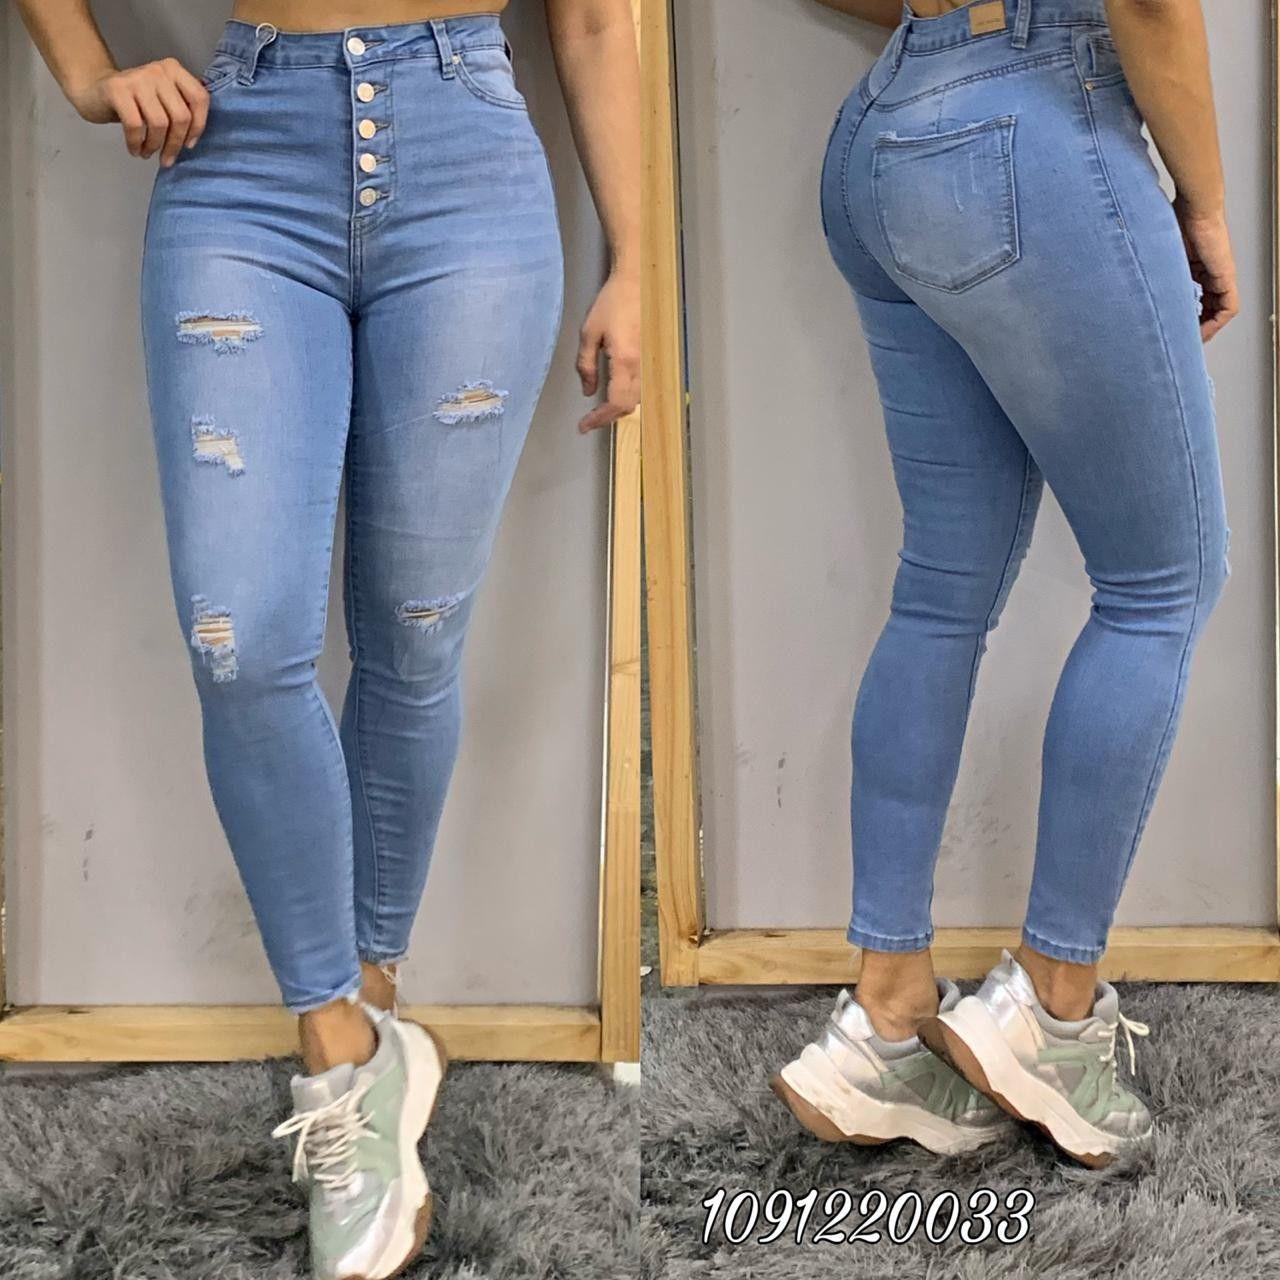 Jeans Dama Jean Talle Alto Moda Jeans